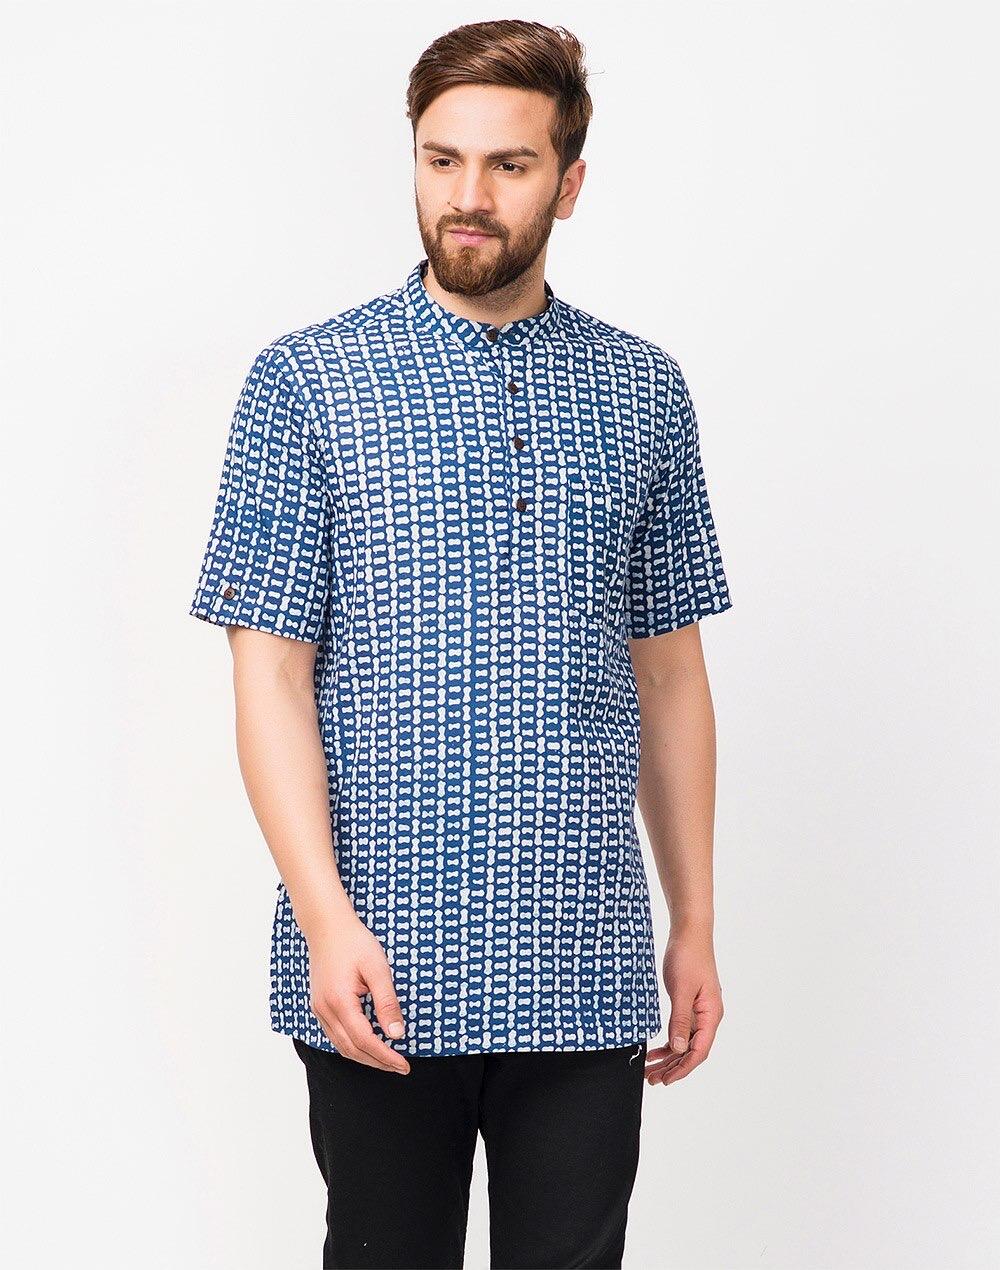 Model baju batik pria unik